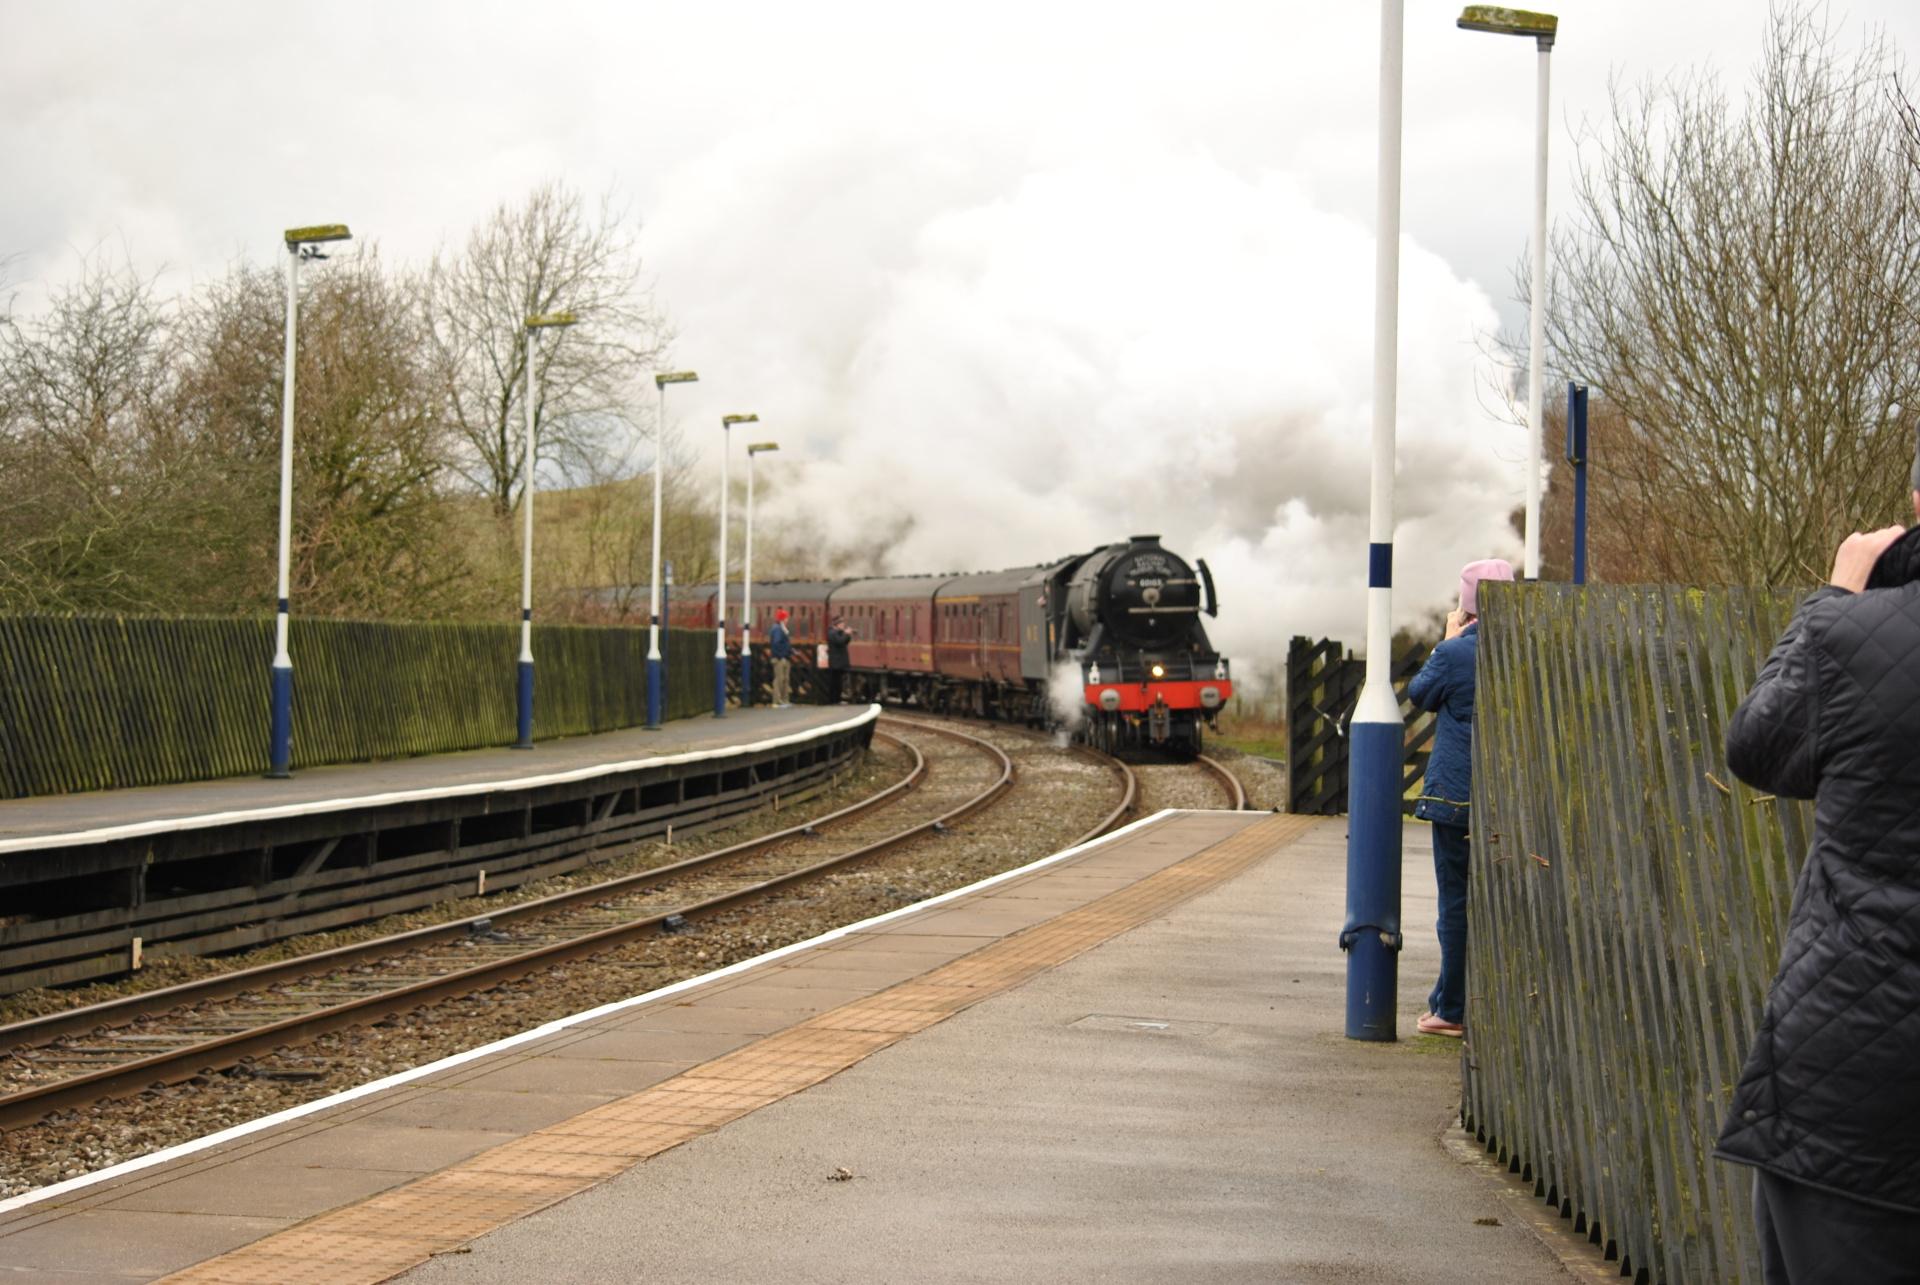 Flying Scotsman, train, steam train, engine